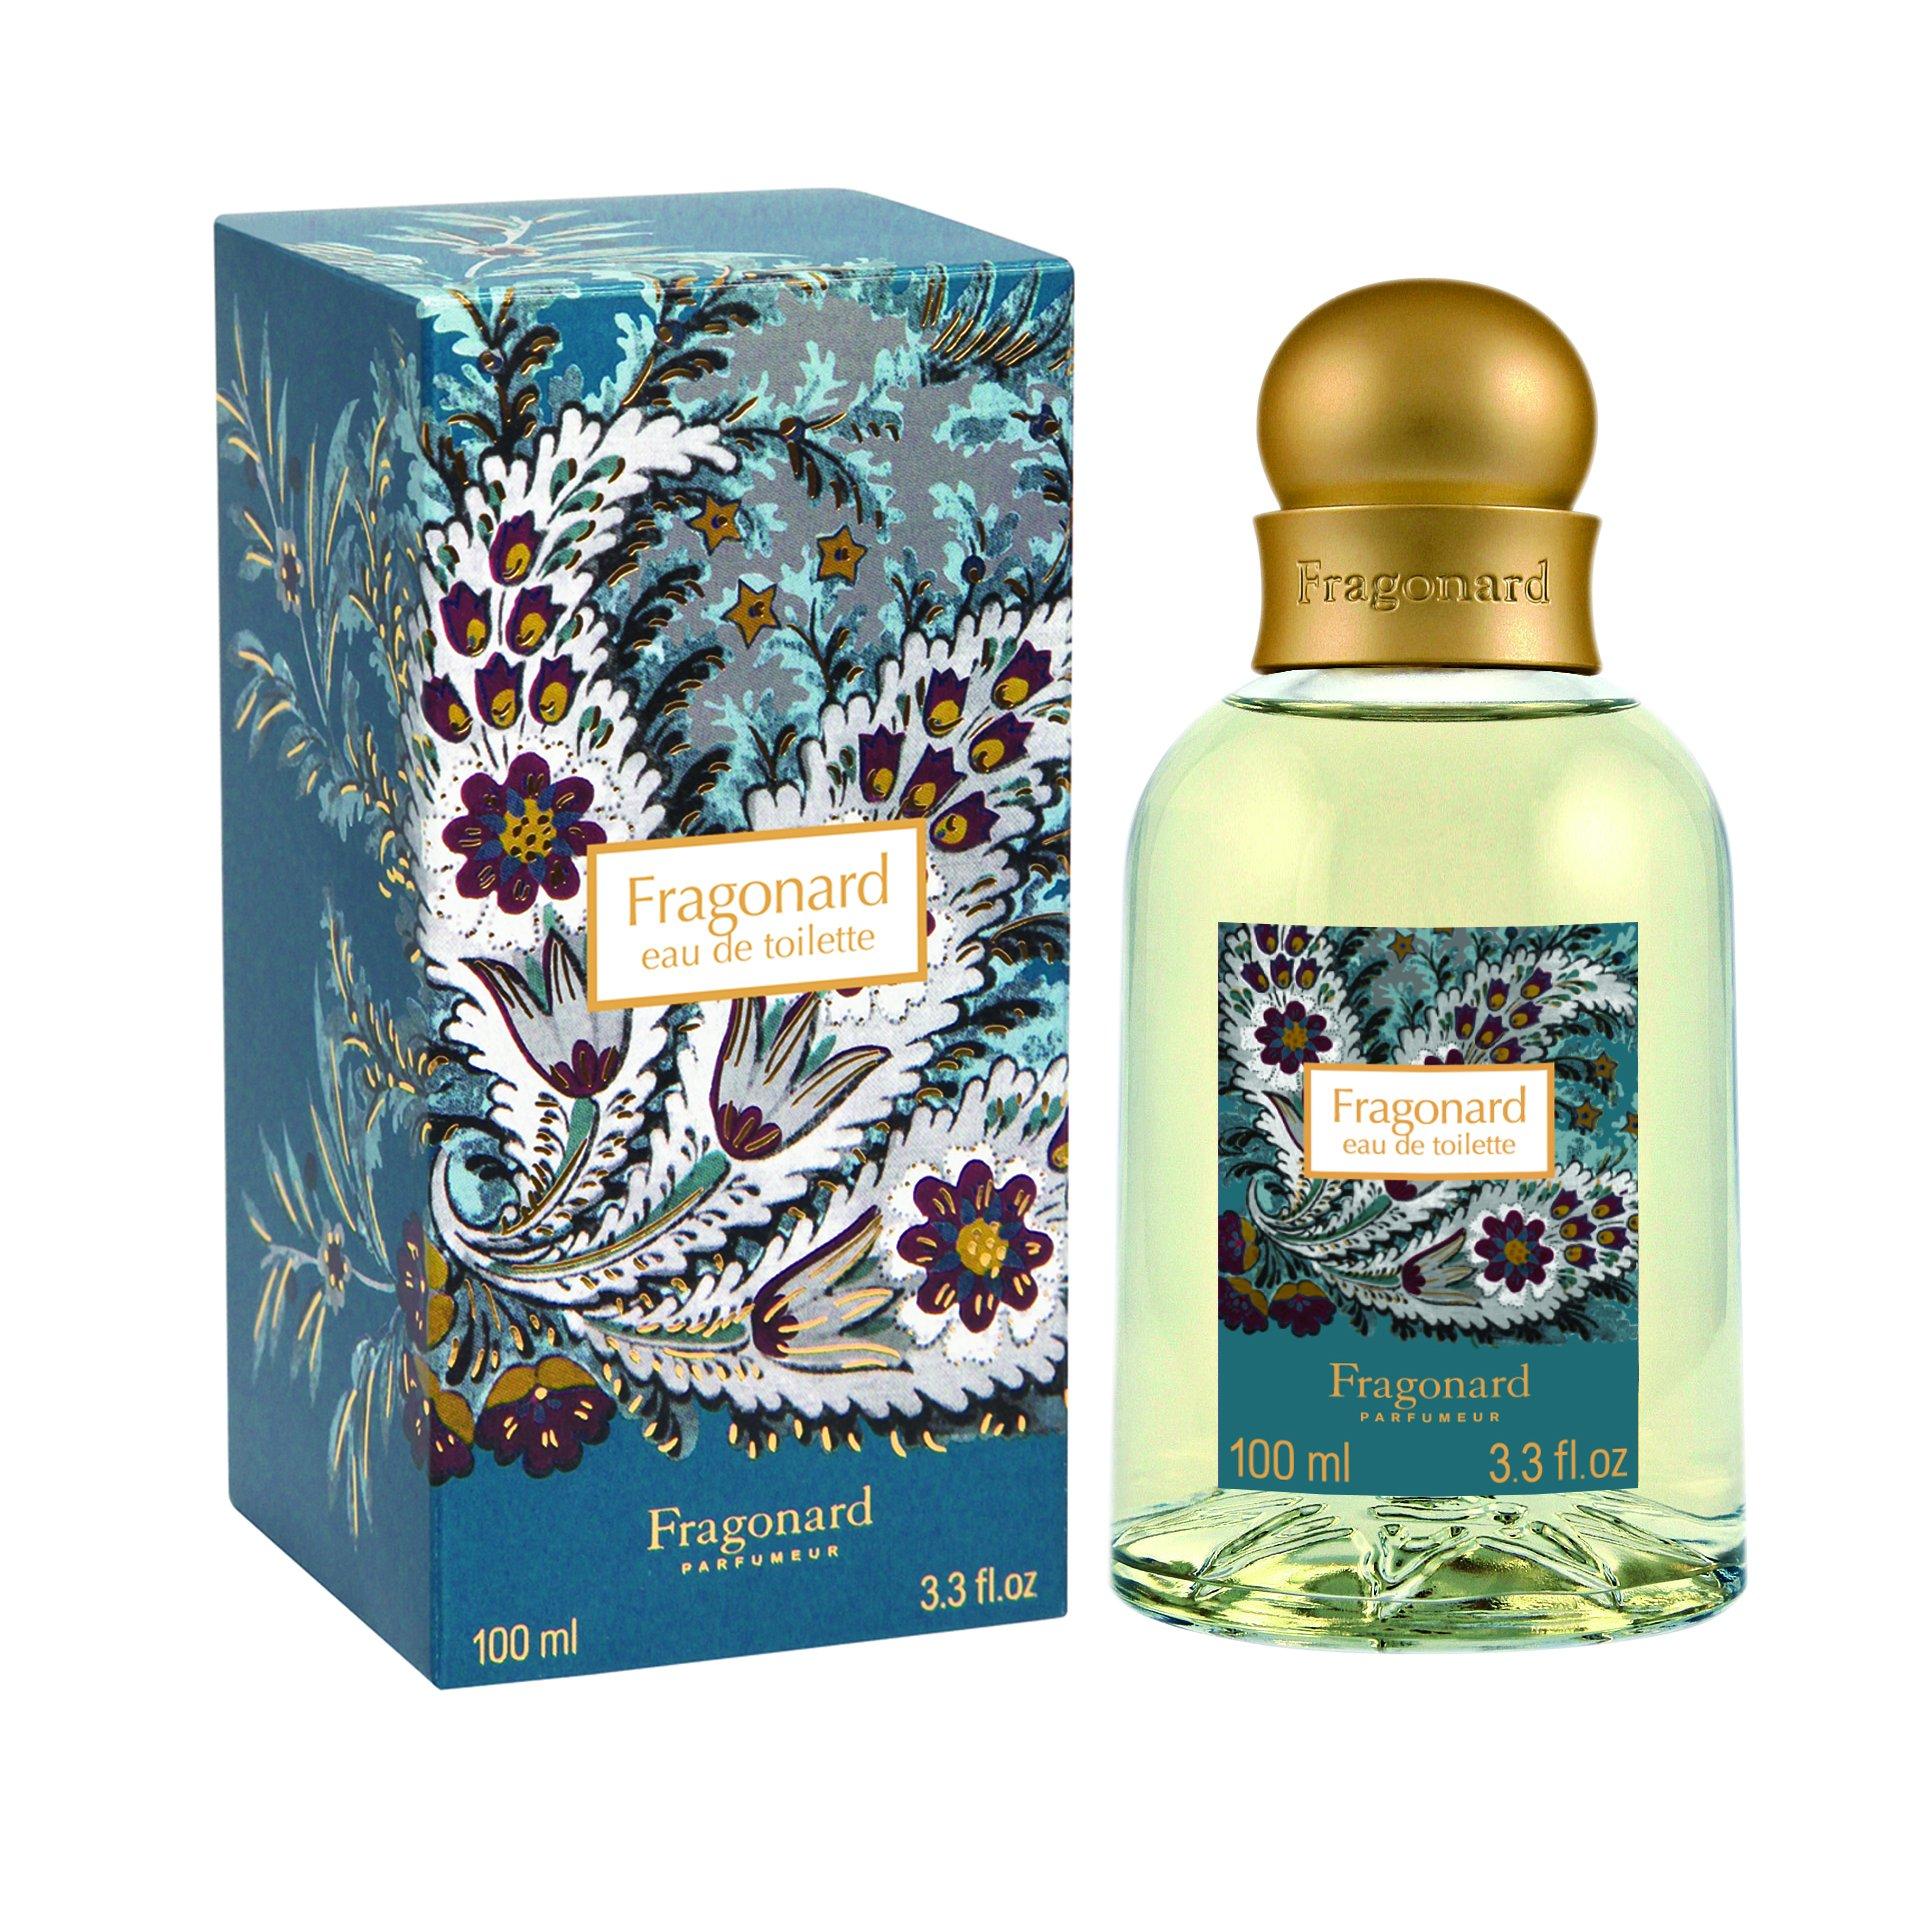 Amazoncom Fragonard Parfumeur Fragonard Eau De Toilette 100 Ml